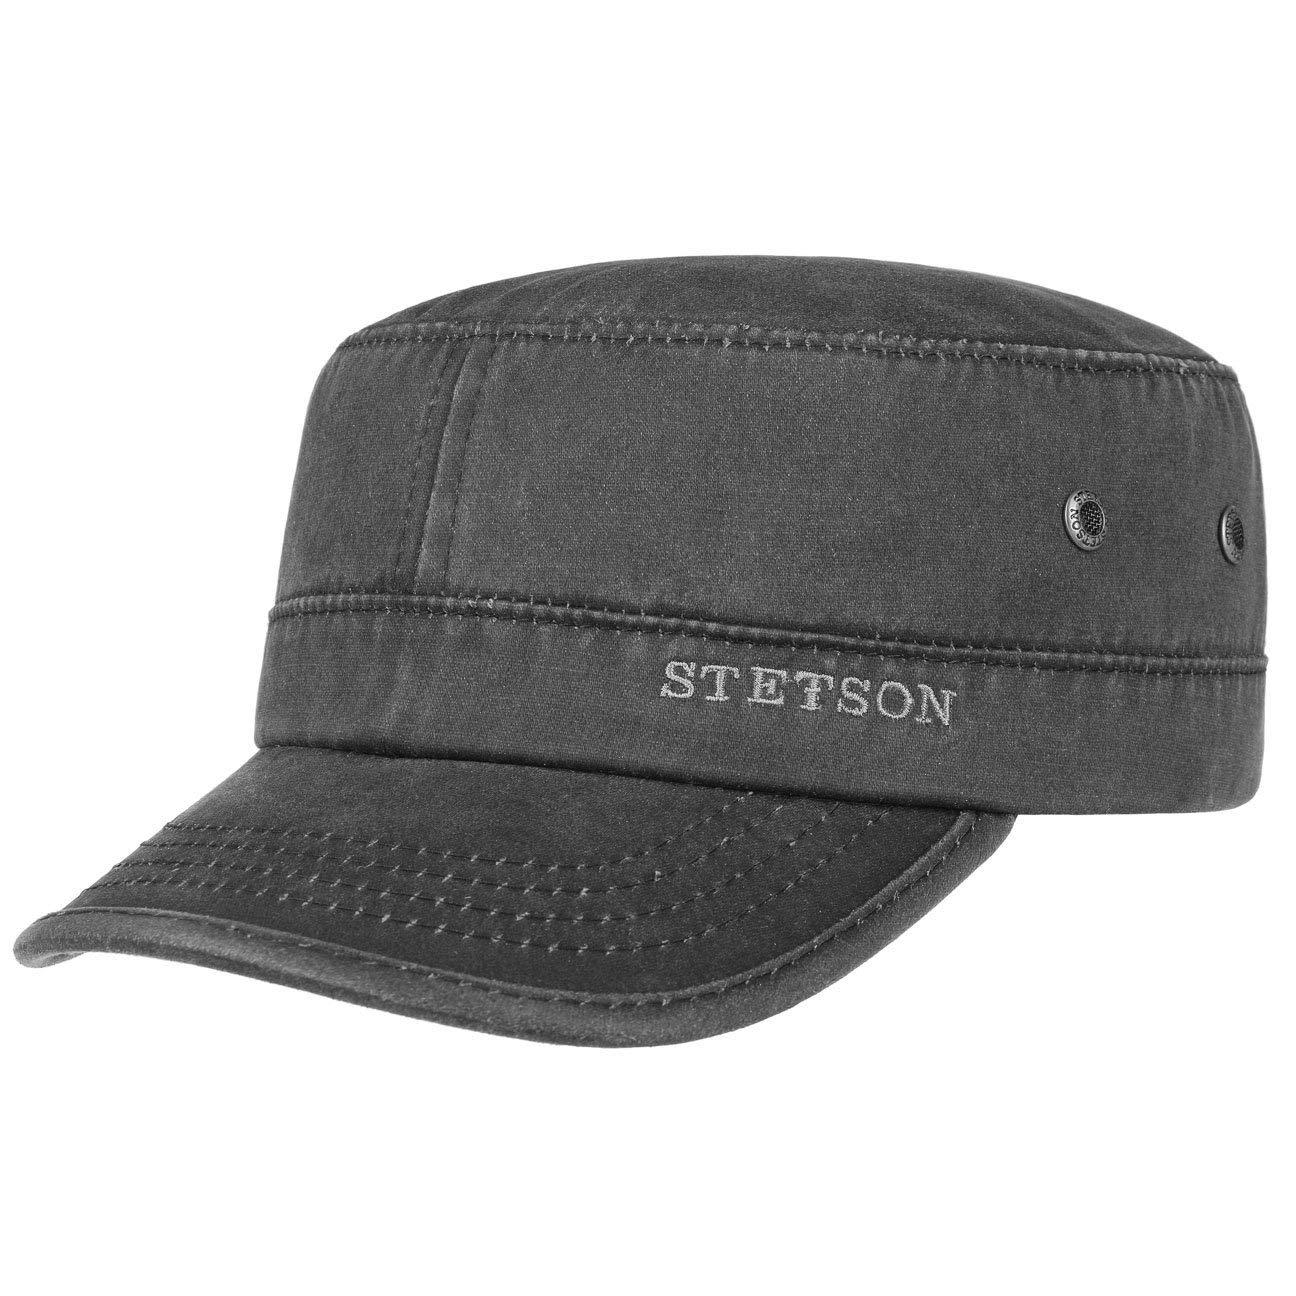 6b7e44596d9 Stetson Datto Men s Army Cap